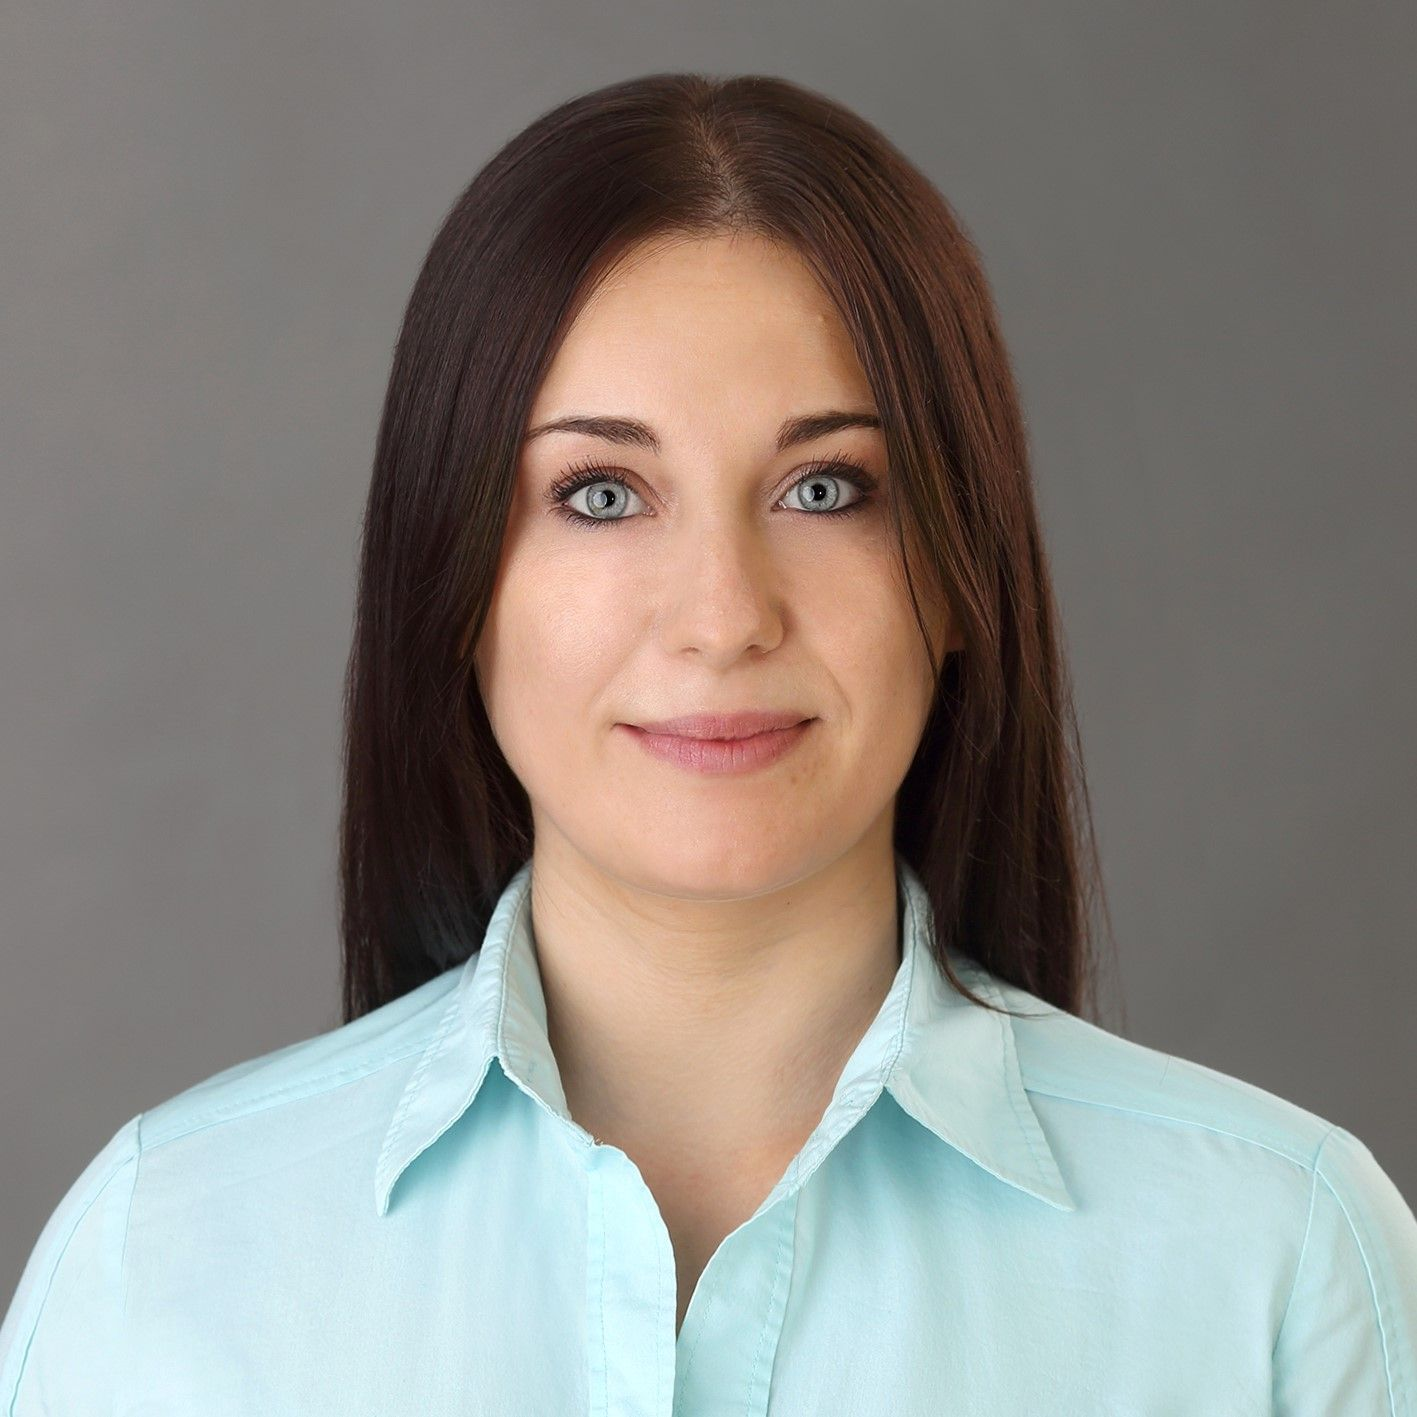 Stefanie Dangl